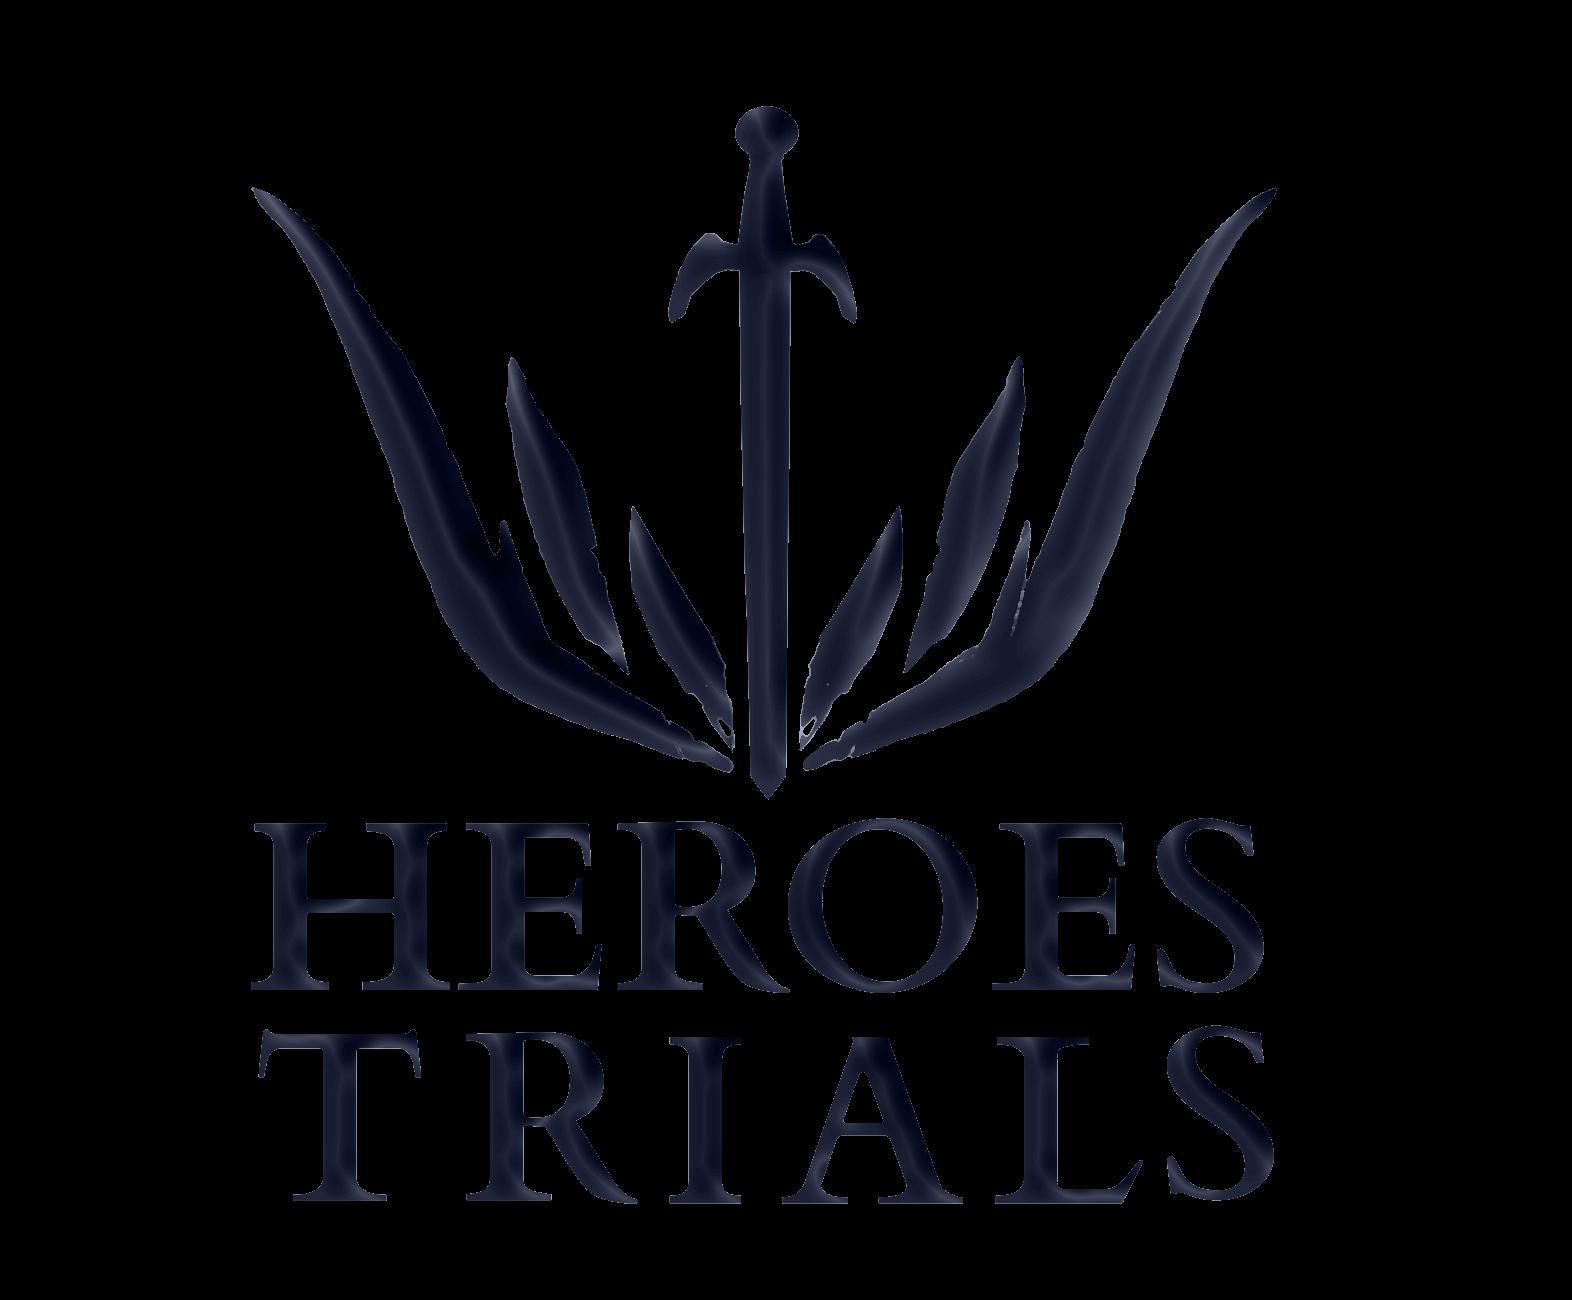 logo-1-blue-1572x1300